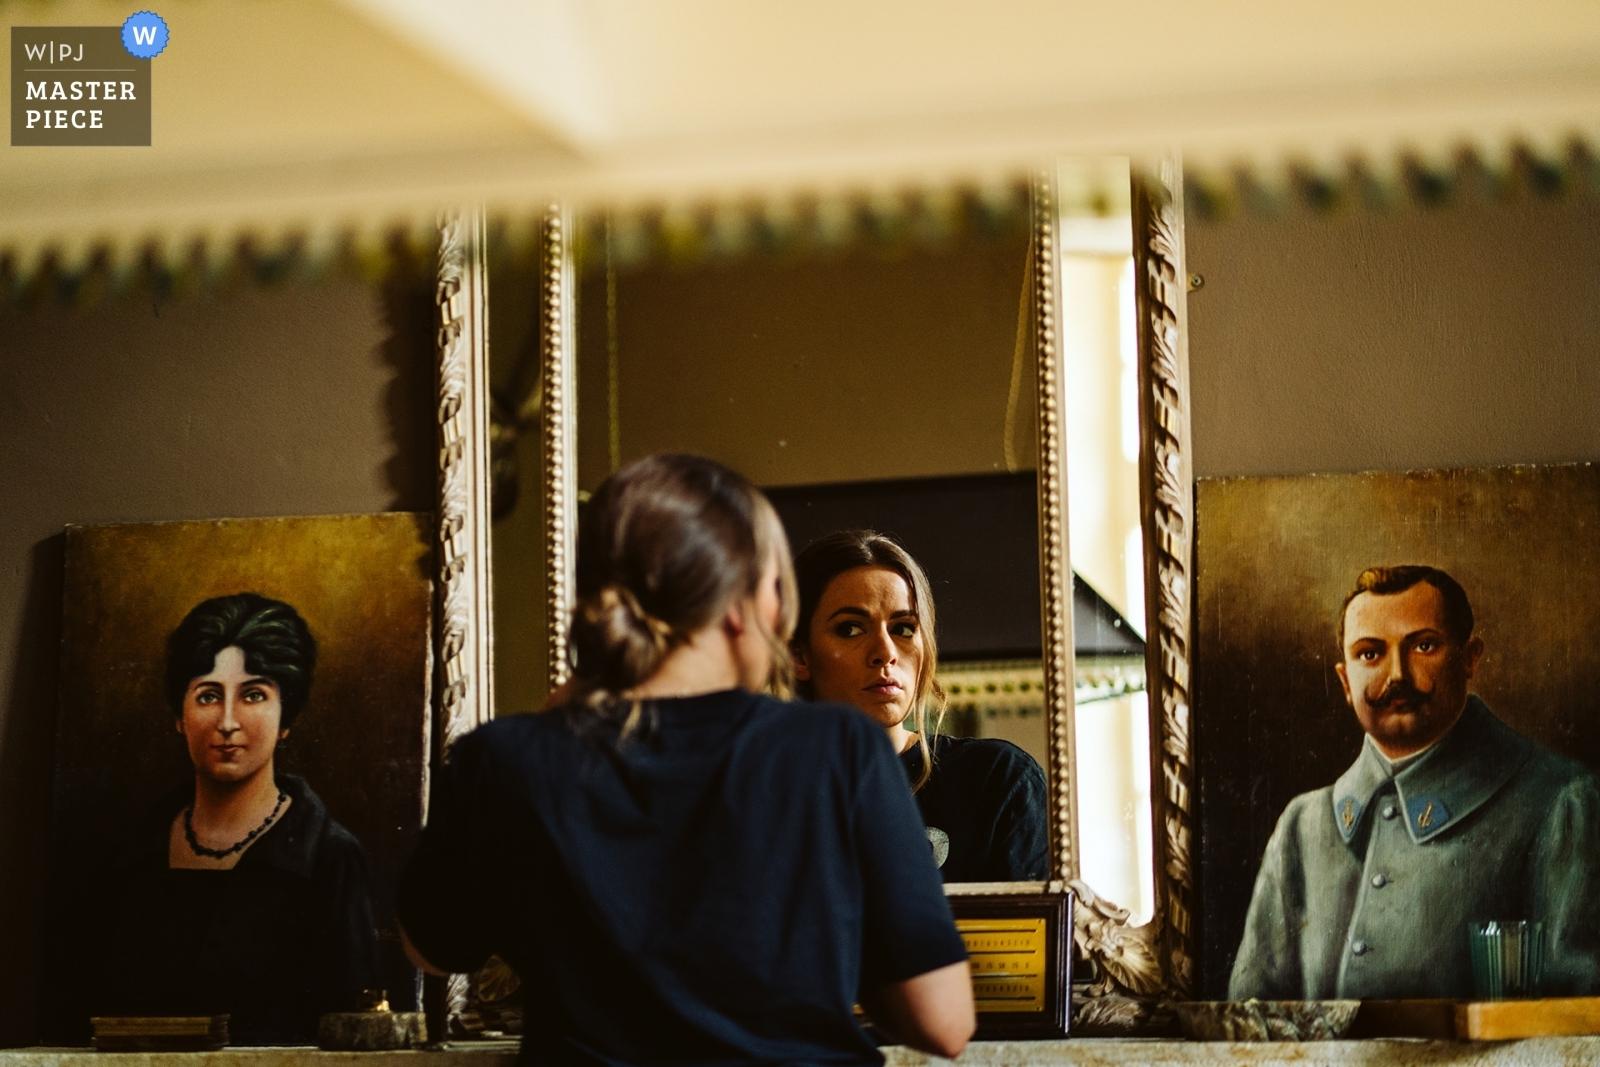 Bridesmaid preparation - Greater Manchester, England Wedding Photography -  | Chateau Lartigolle, France